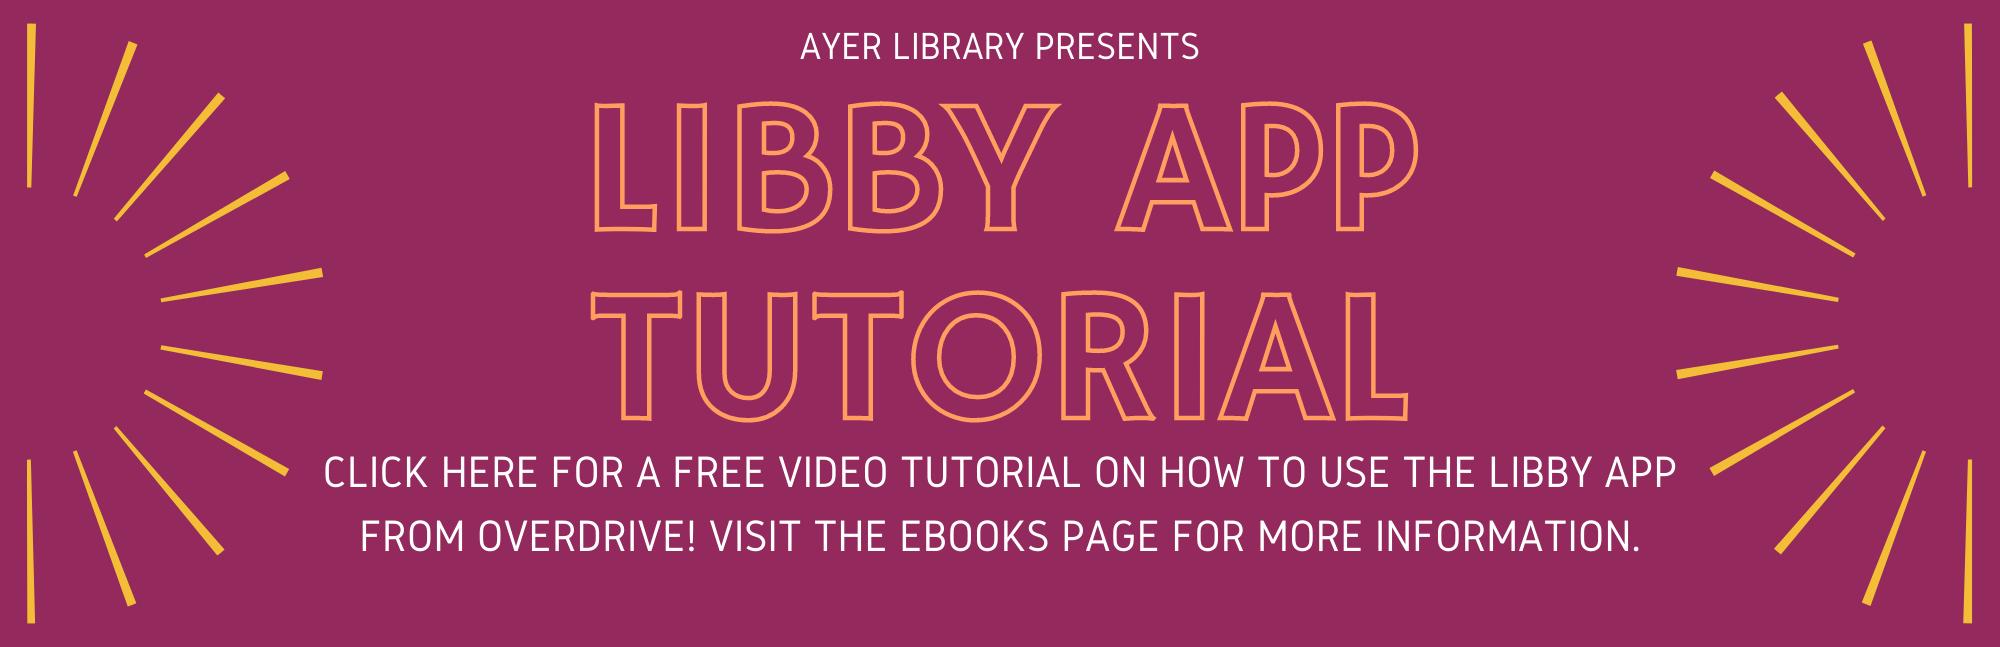 Libby App tutorial